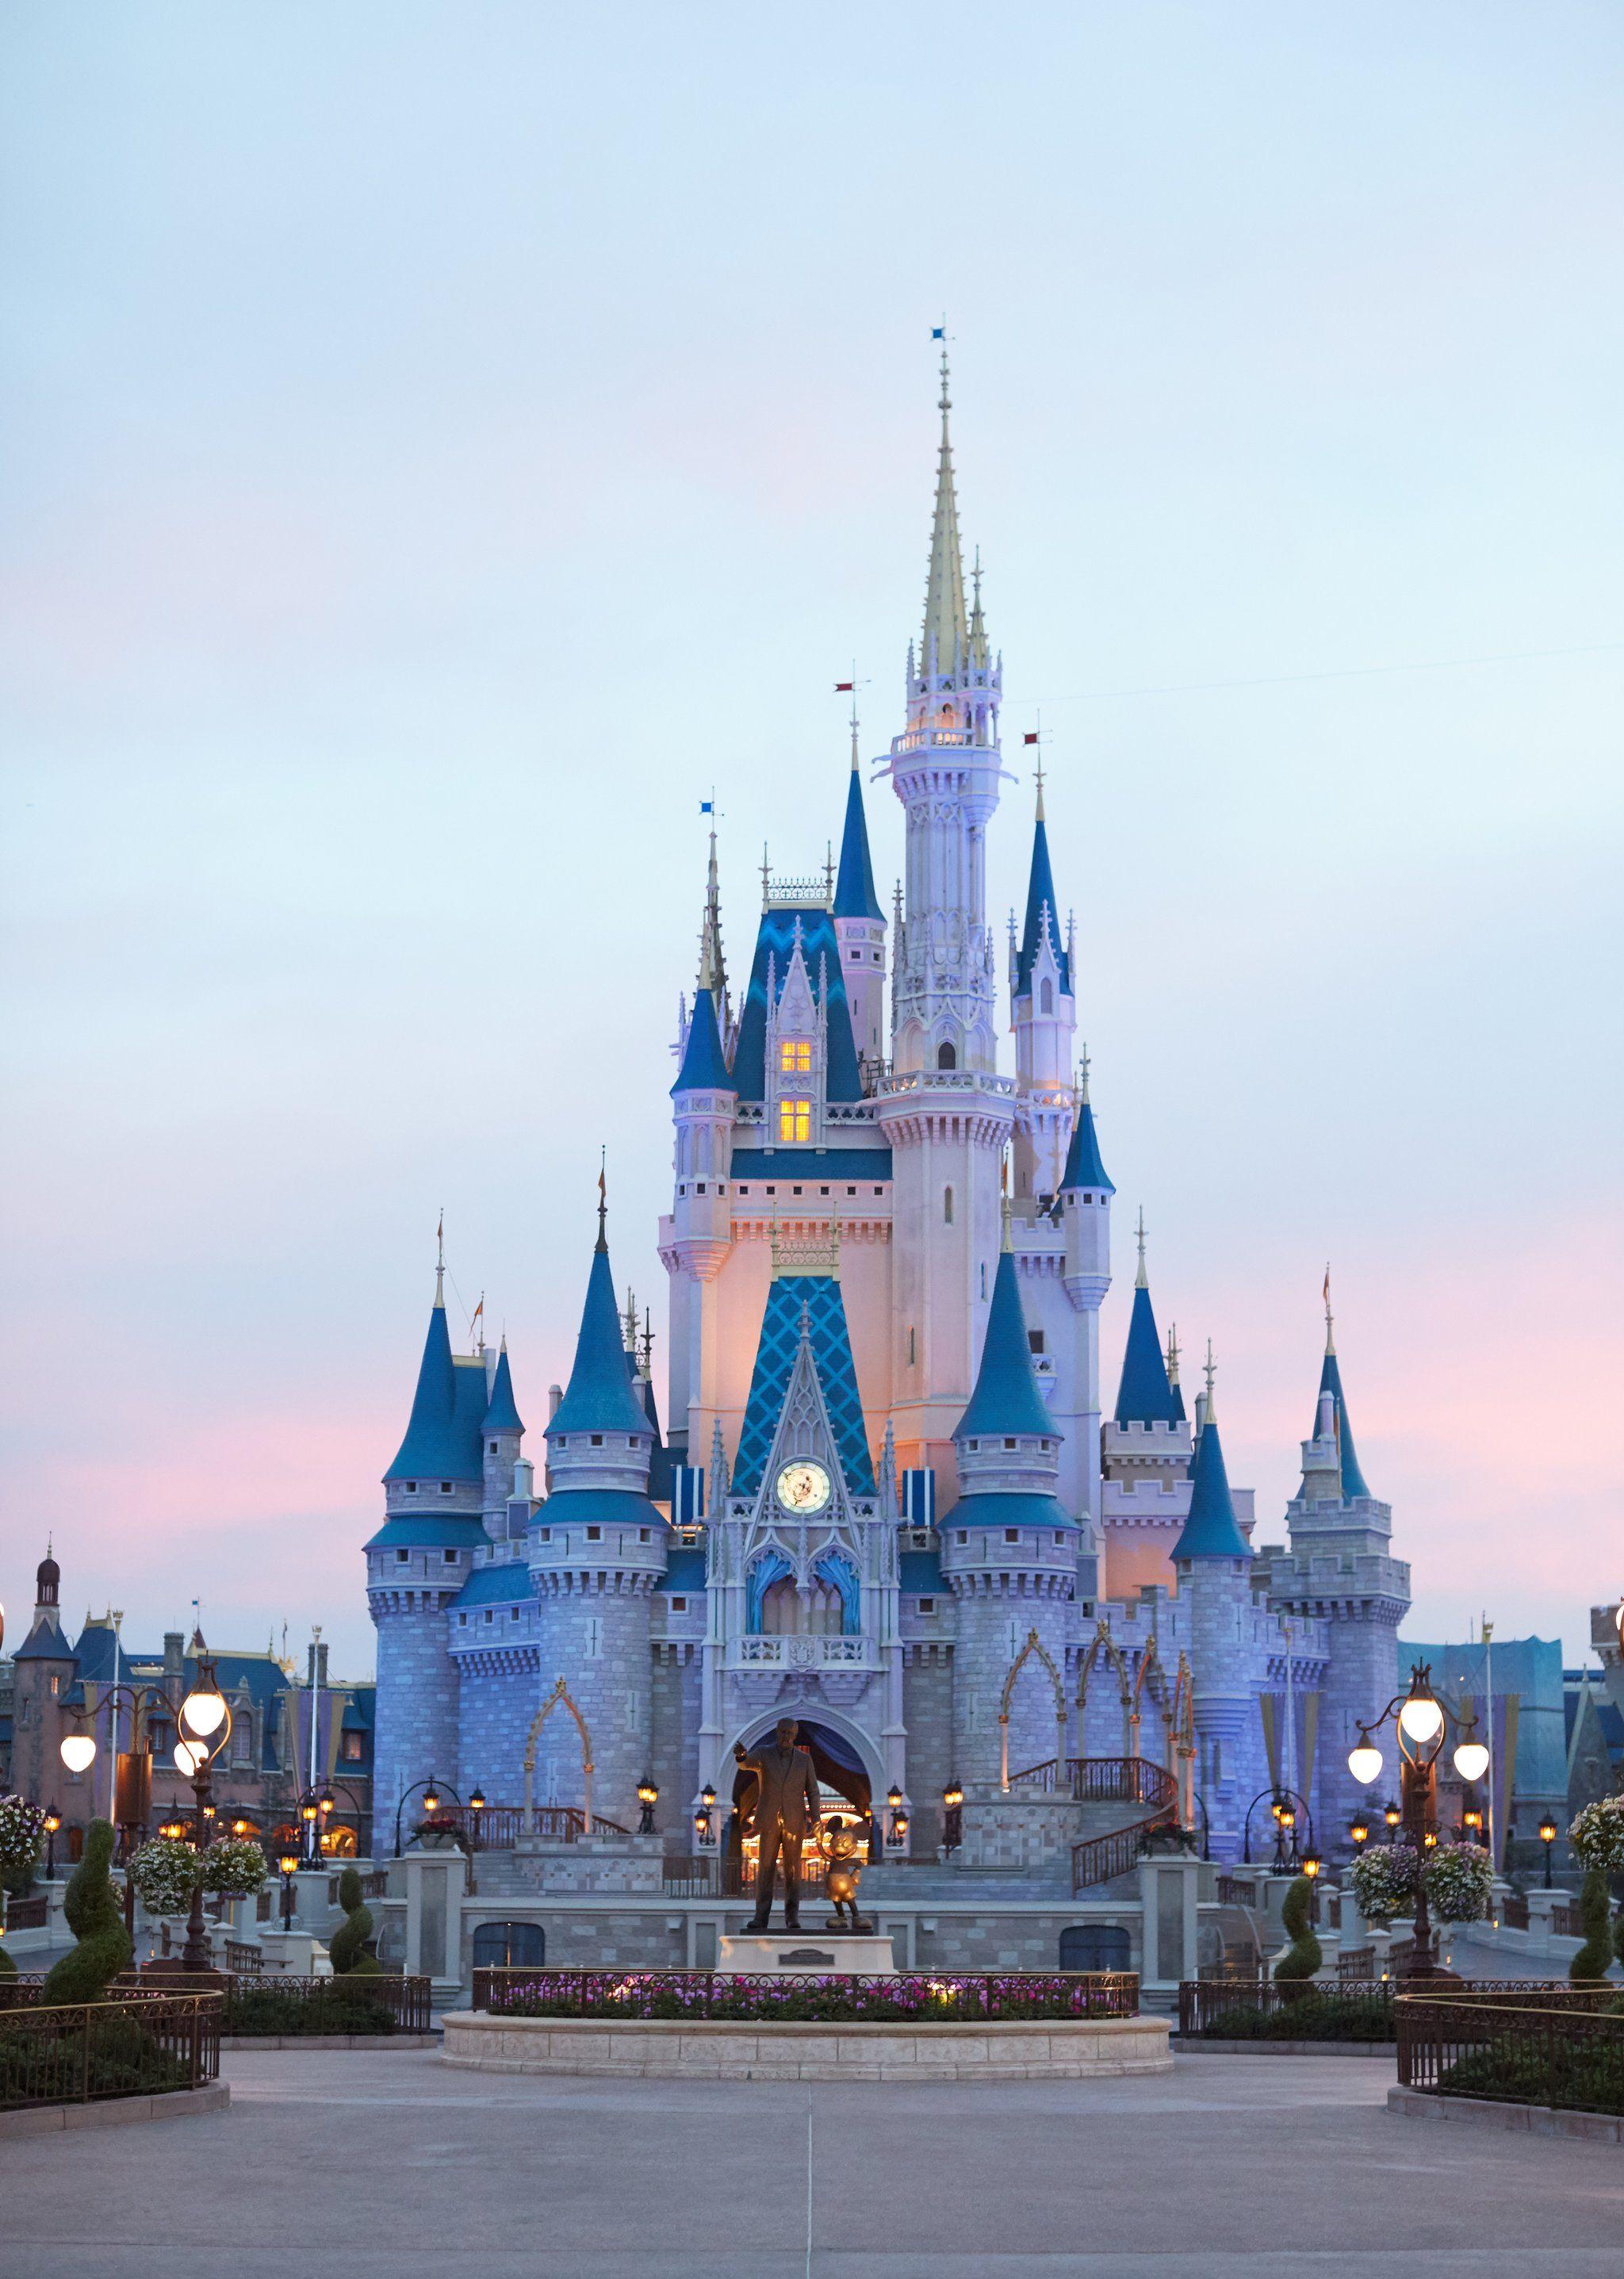 Welcome To Wdwnewscom! Home Of Everything Walt Disney - HD2048×2048